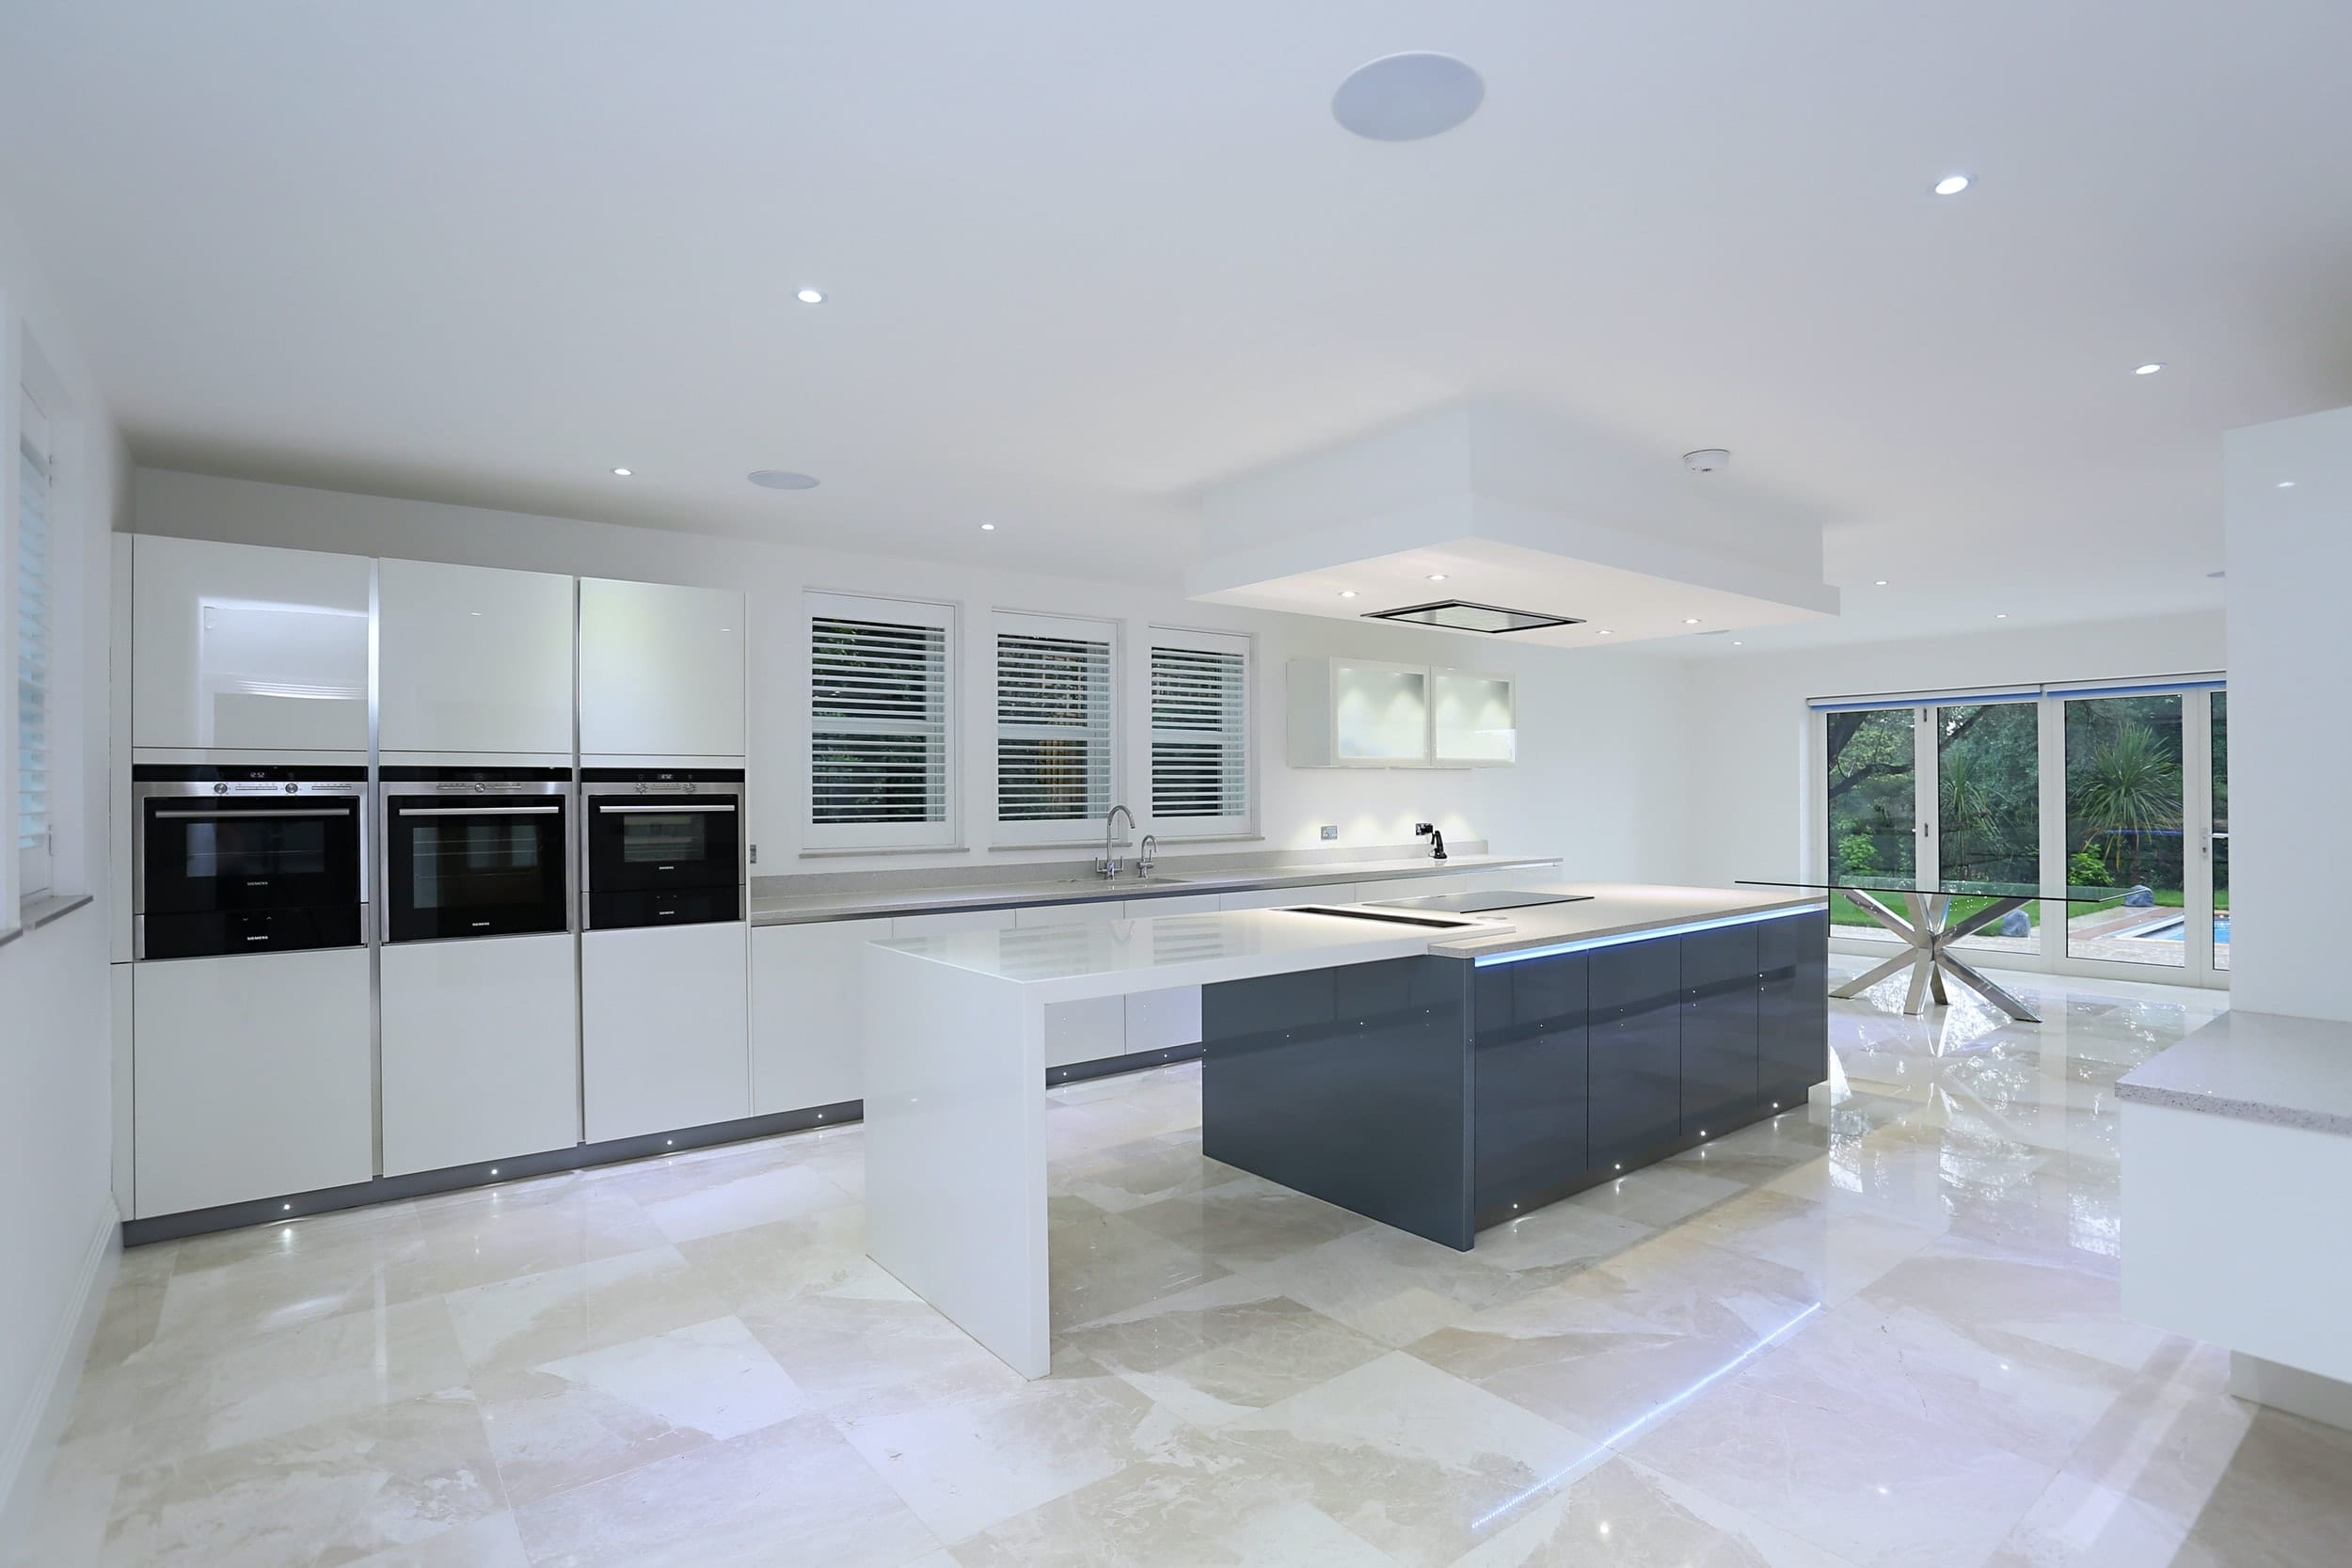 1. Handleless glass kitchen design 1 - Alon Interiors, Larkfield